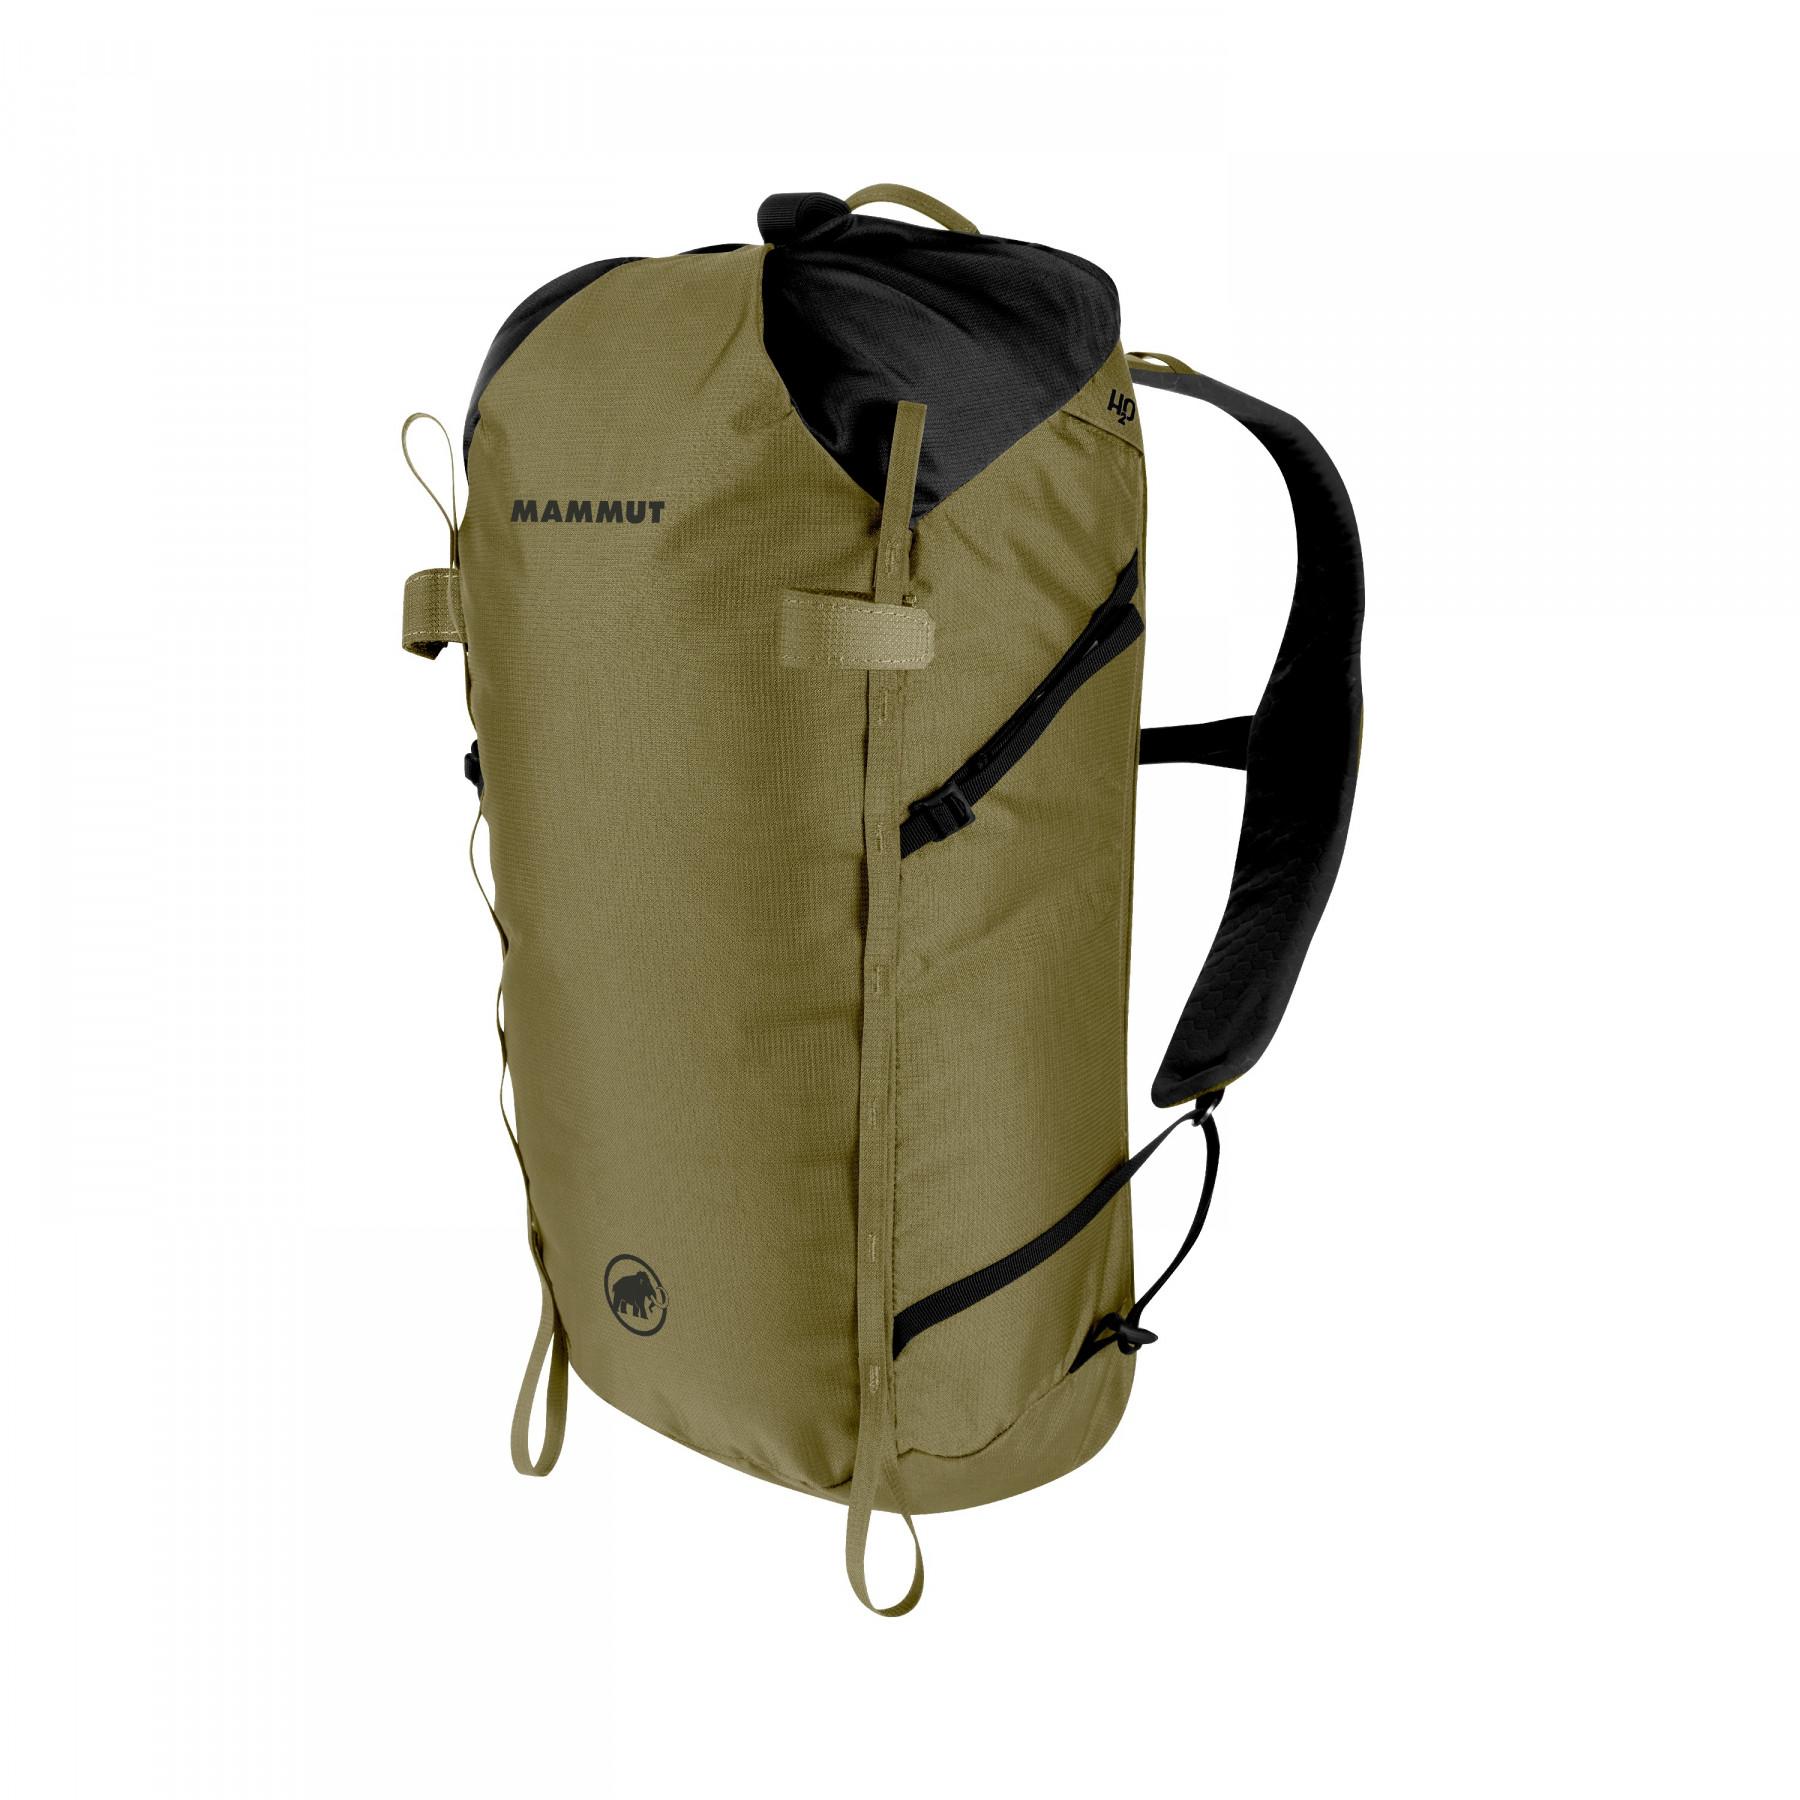 Strange Mammut Trion 18 Alpine Backpack Inzonedesignstudio Interior Chair Design Inzonedesignstudiocom